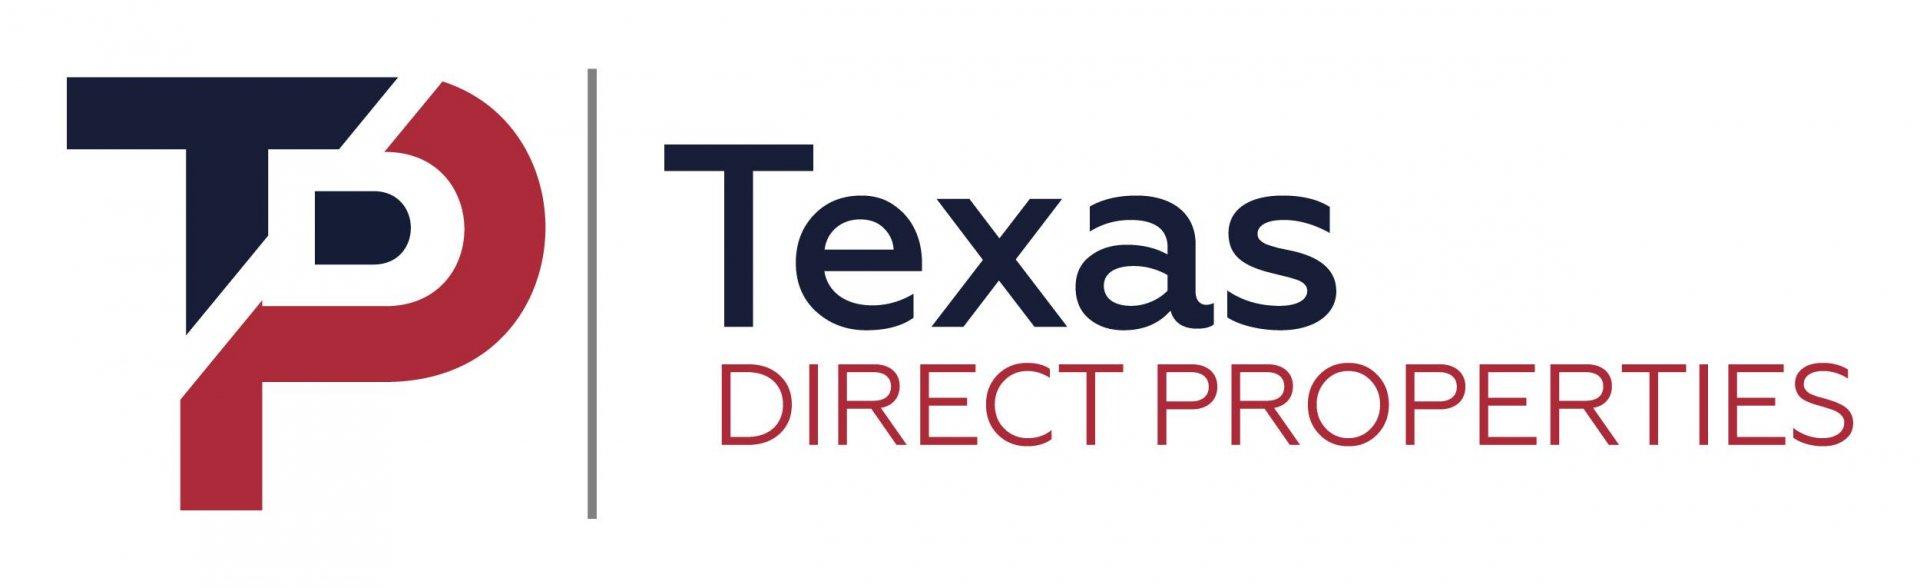 Texas Direct Properties logo